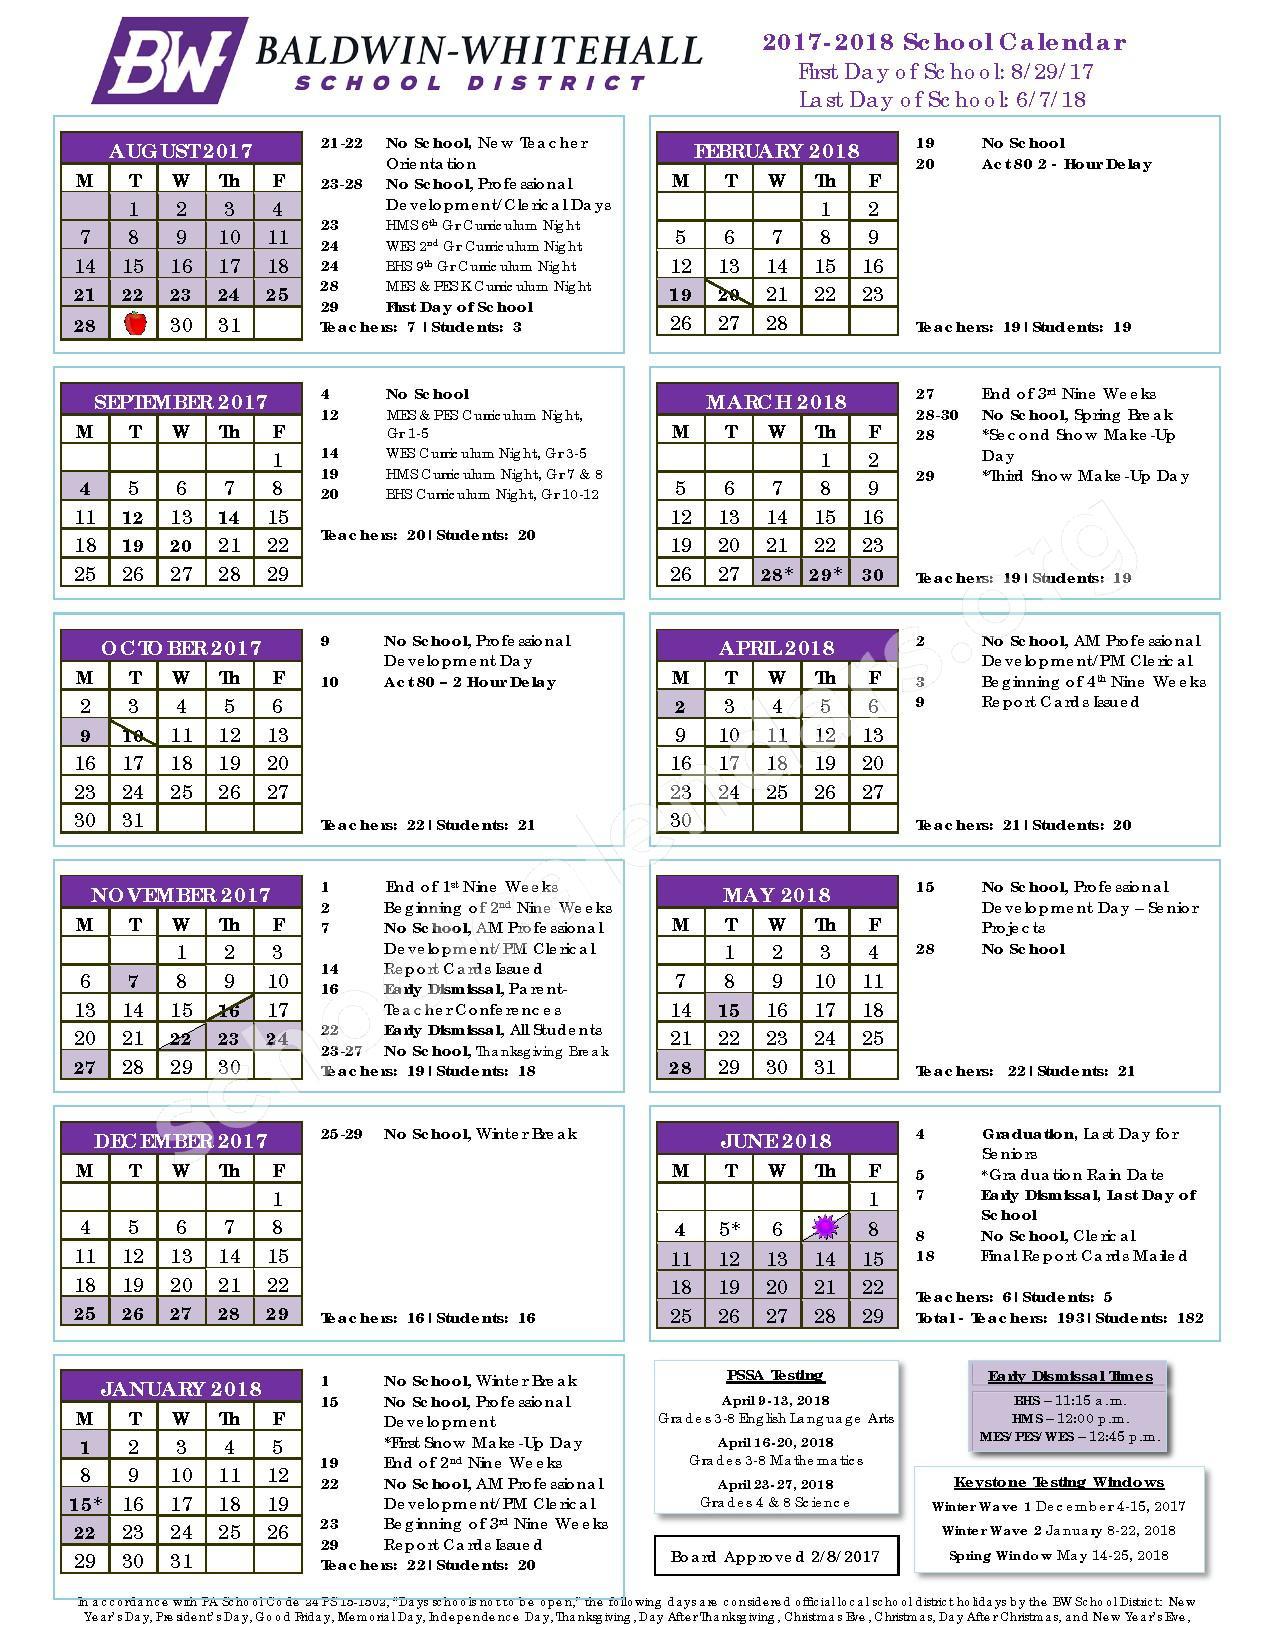 2017 - 2018 District Calendar – Baldwin-Whitehall School District – page 1